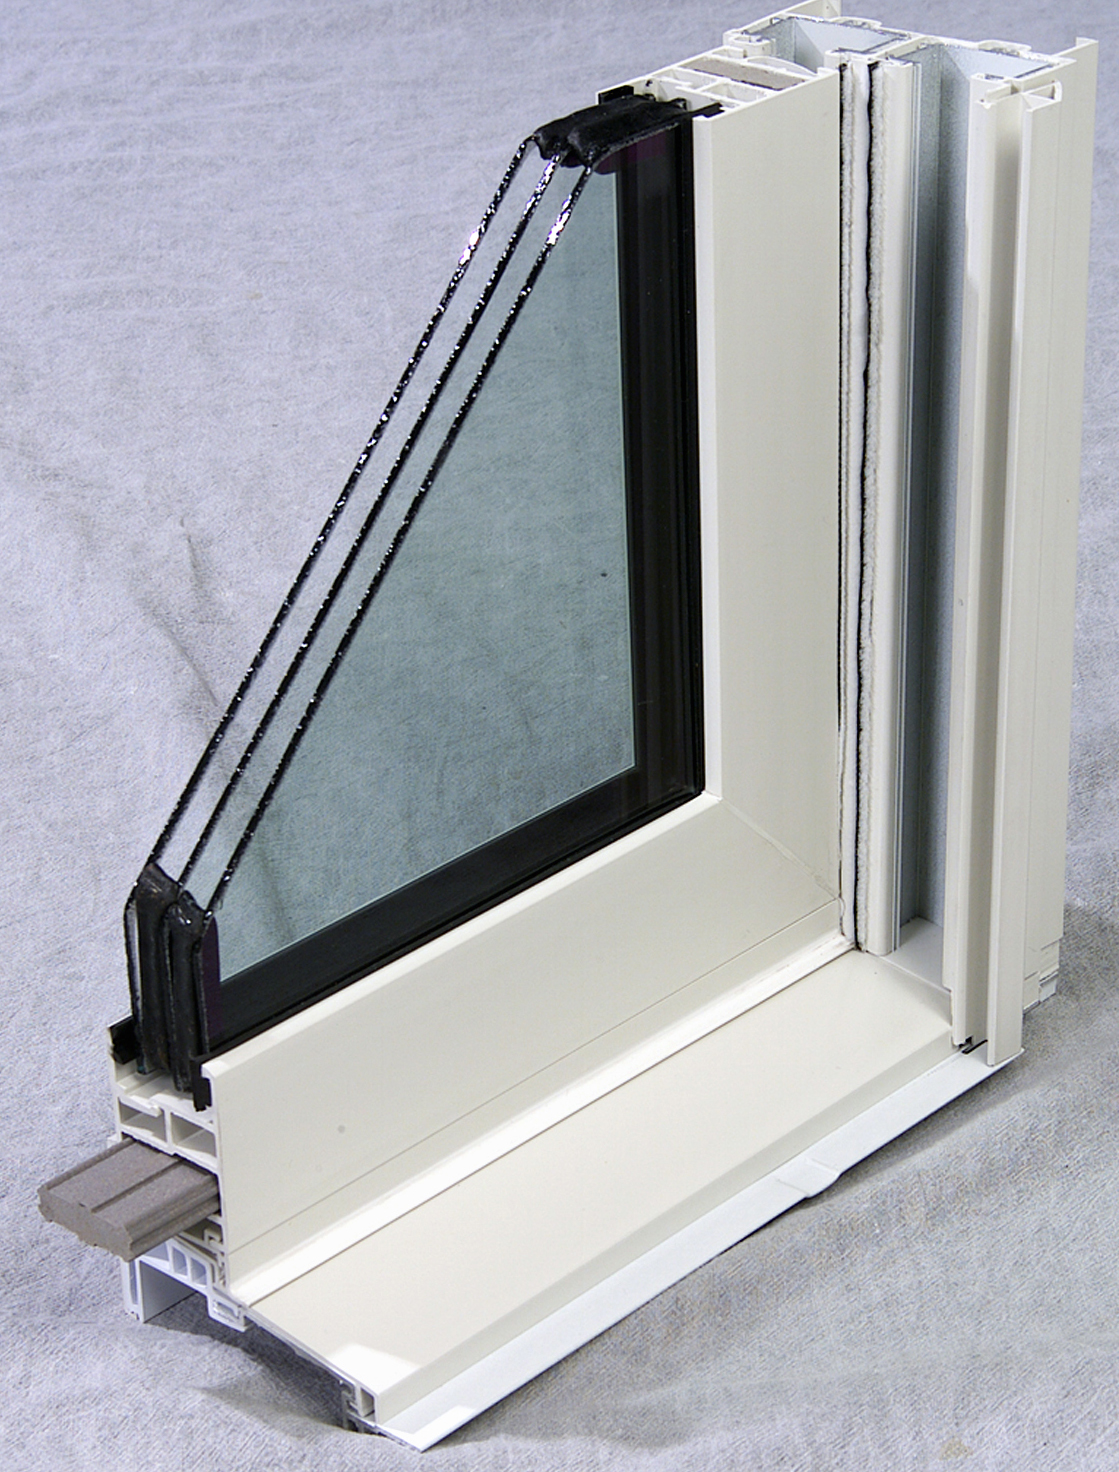 Winchester Announces New Vinyl Replacement Windows